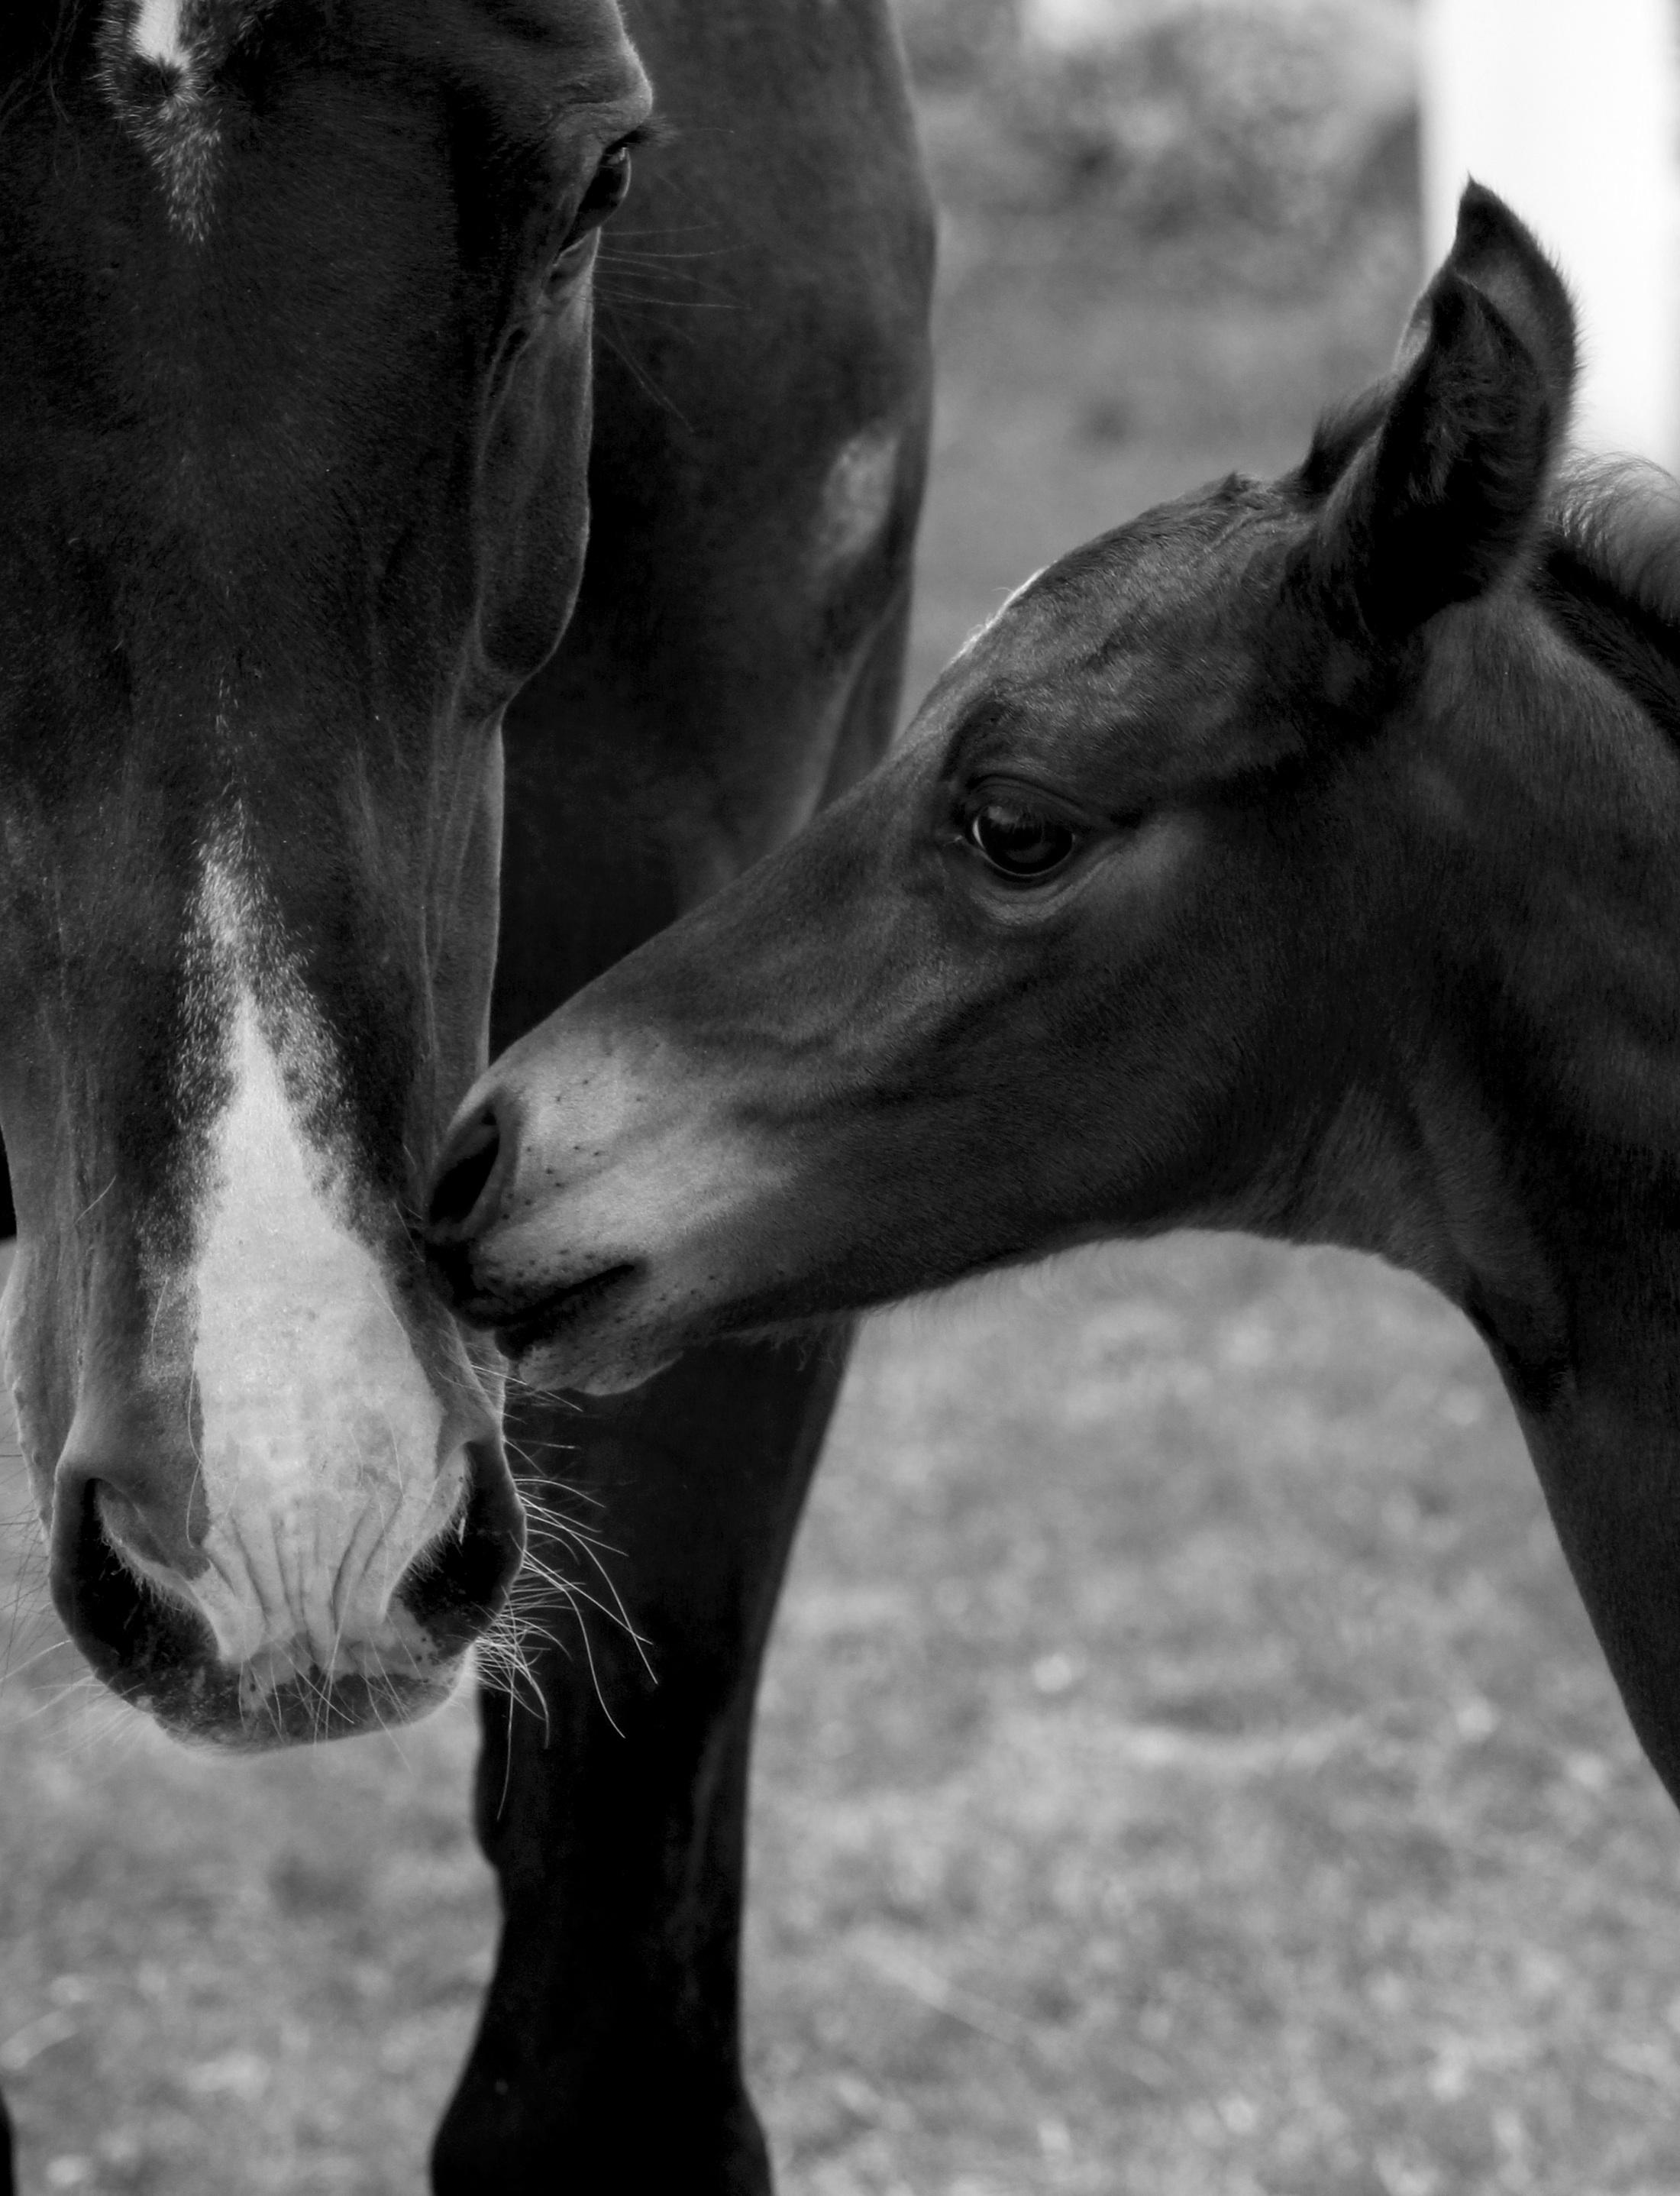 Black and white photography pasture horse mammal stallion mane black monochrome close up head vertebrate mare